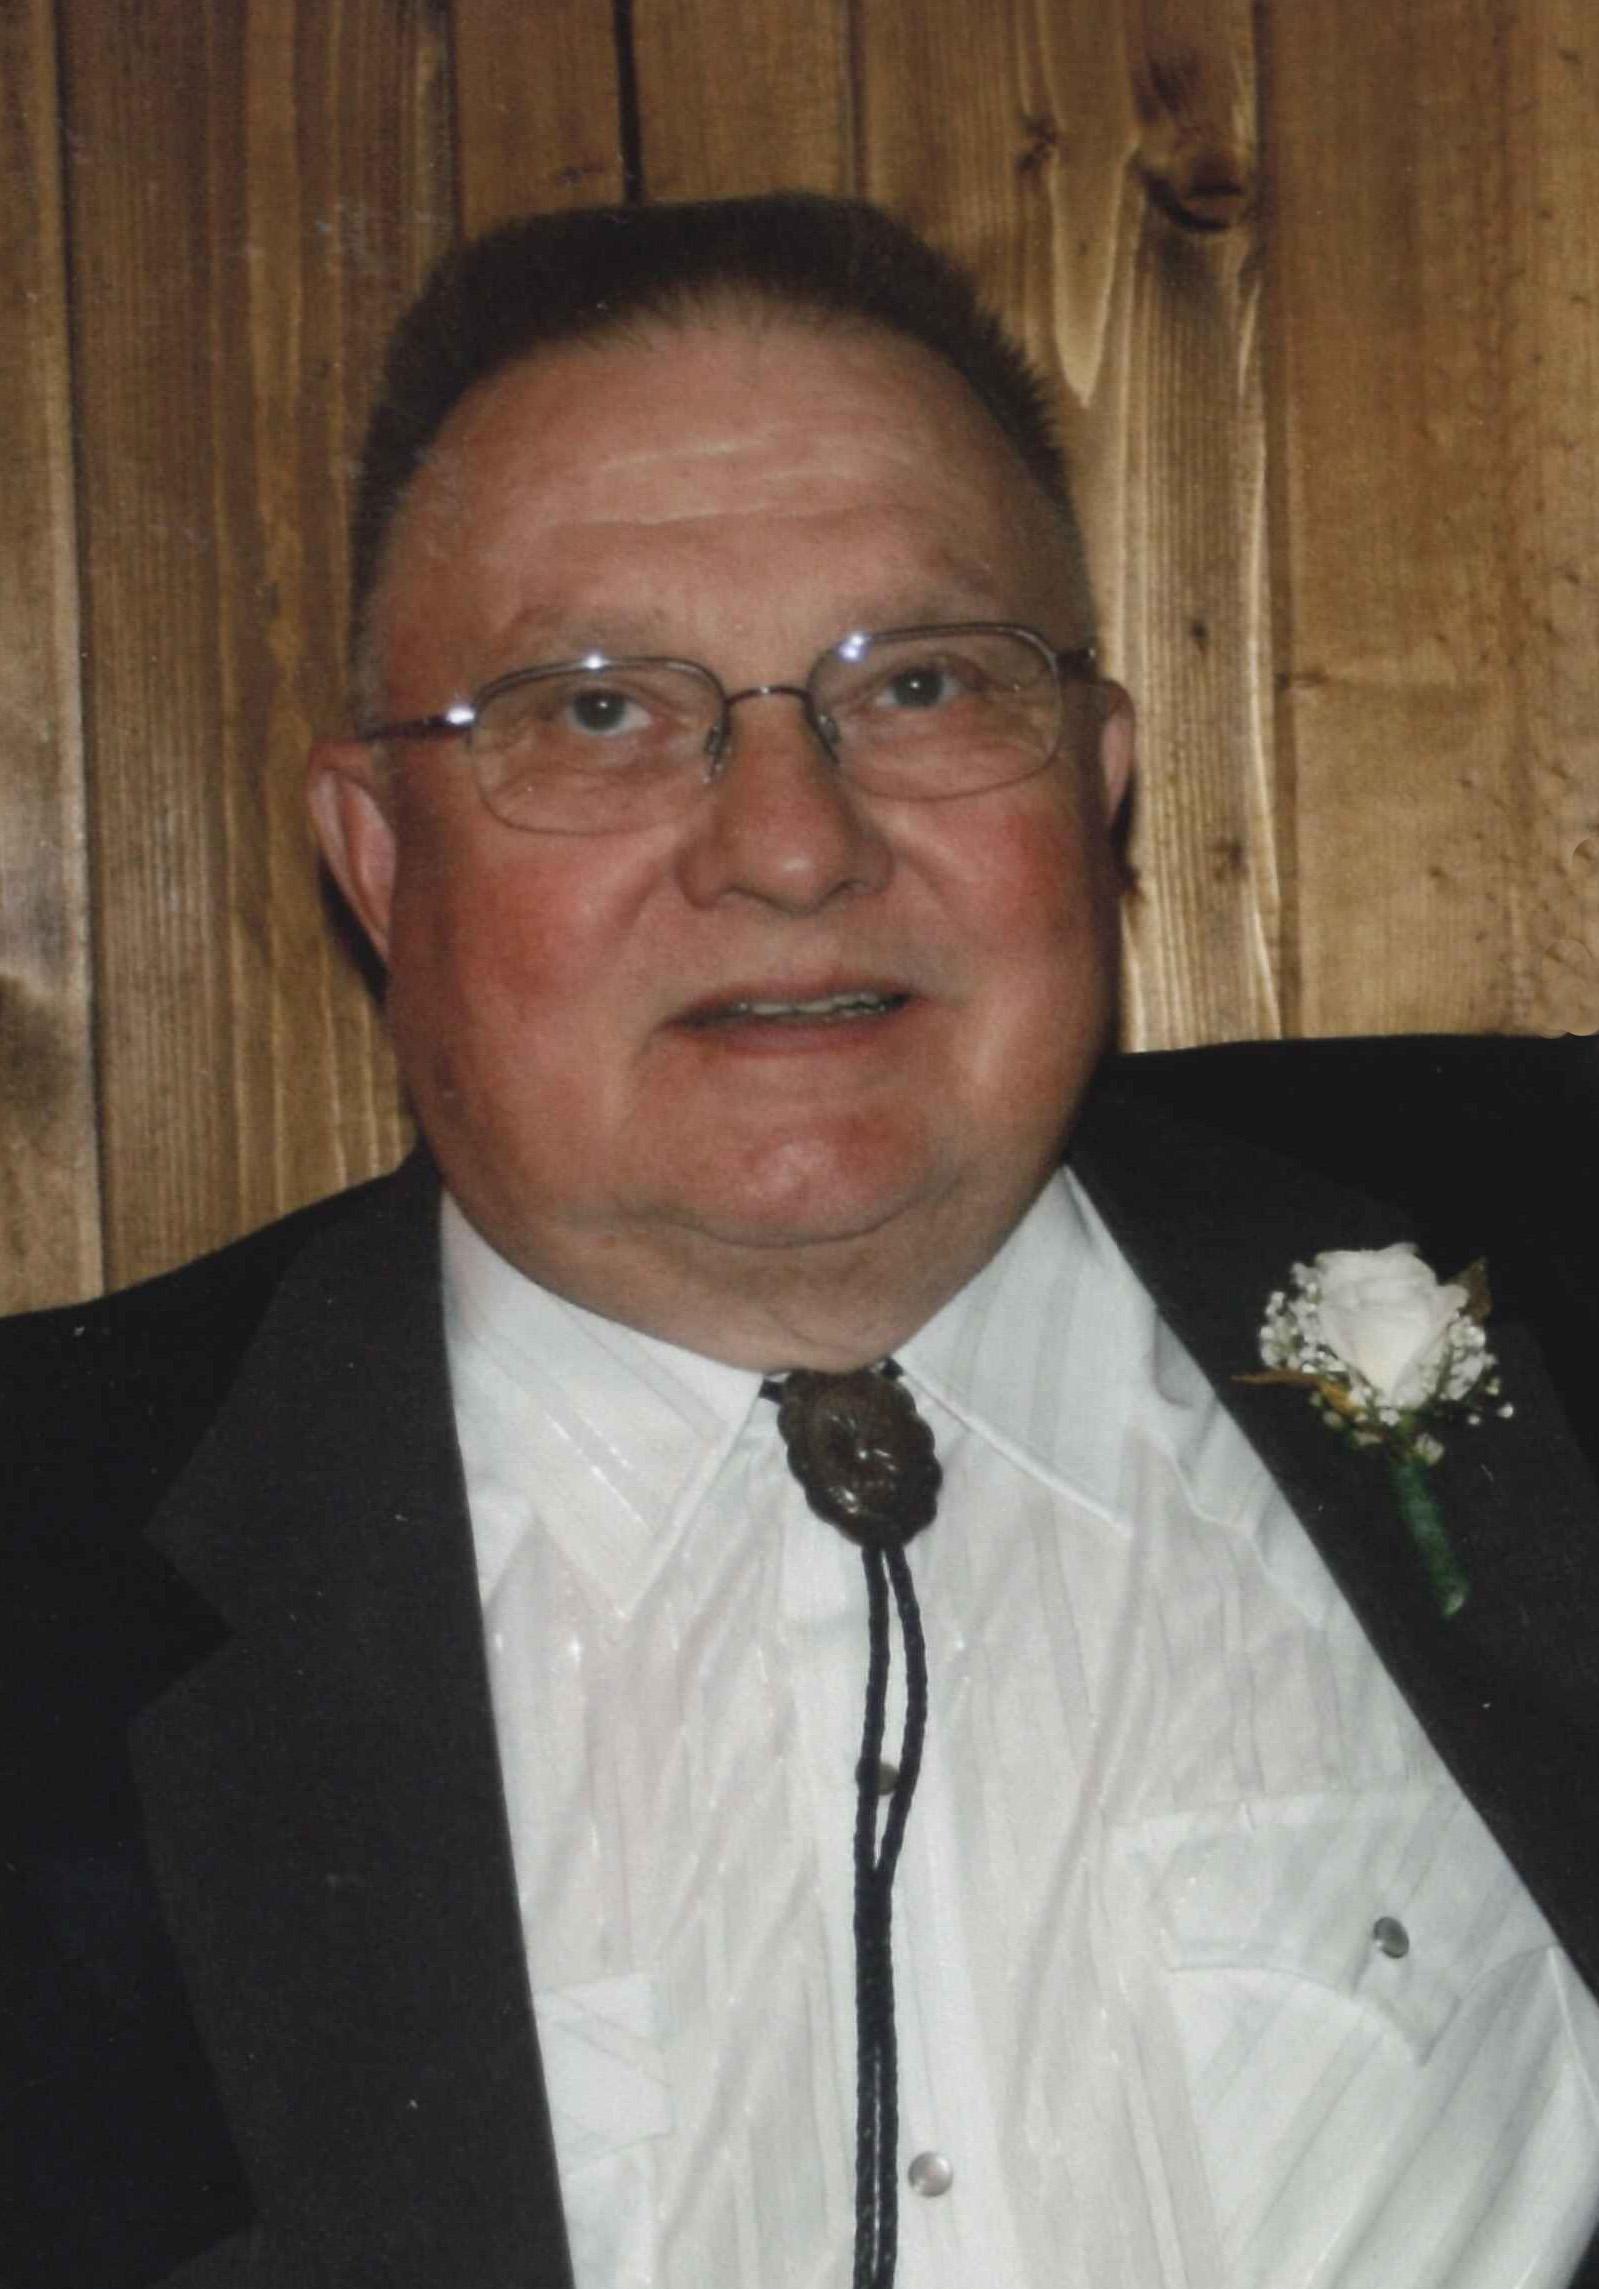 Kendall E. Parcel, age 77, of Lyons, Nebraska